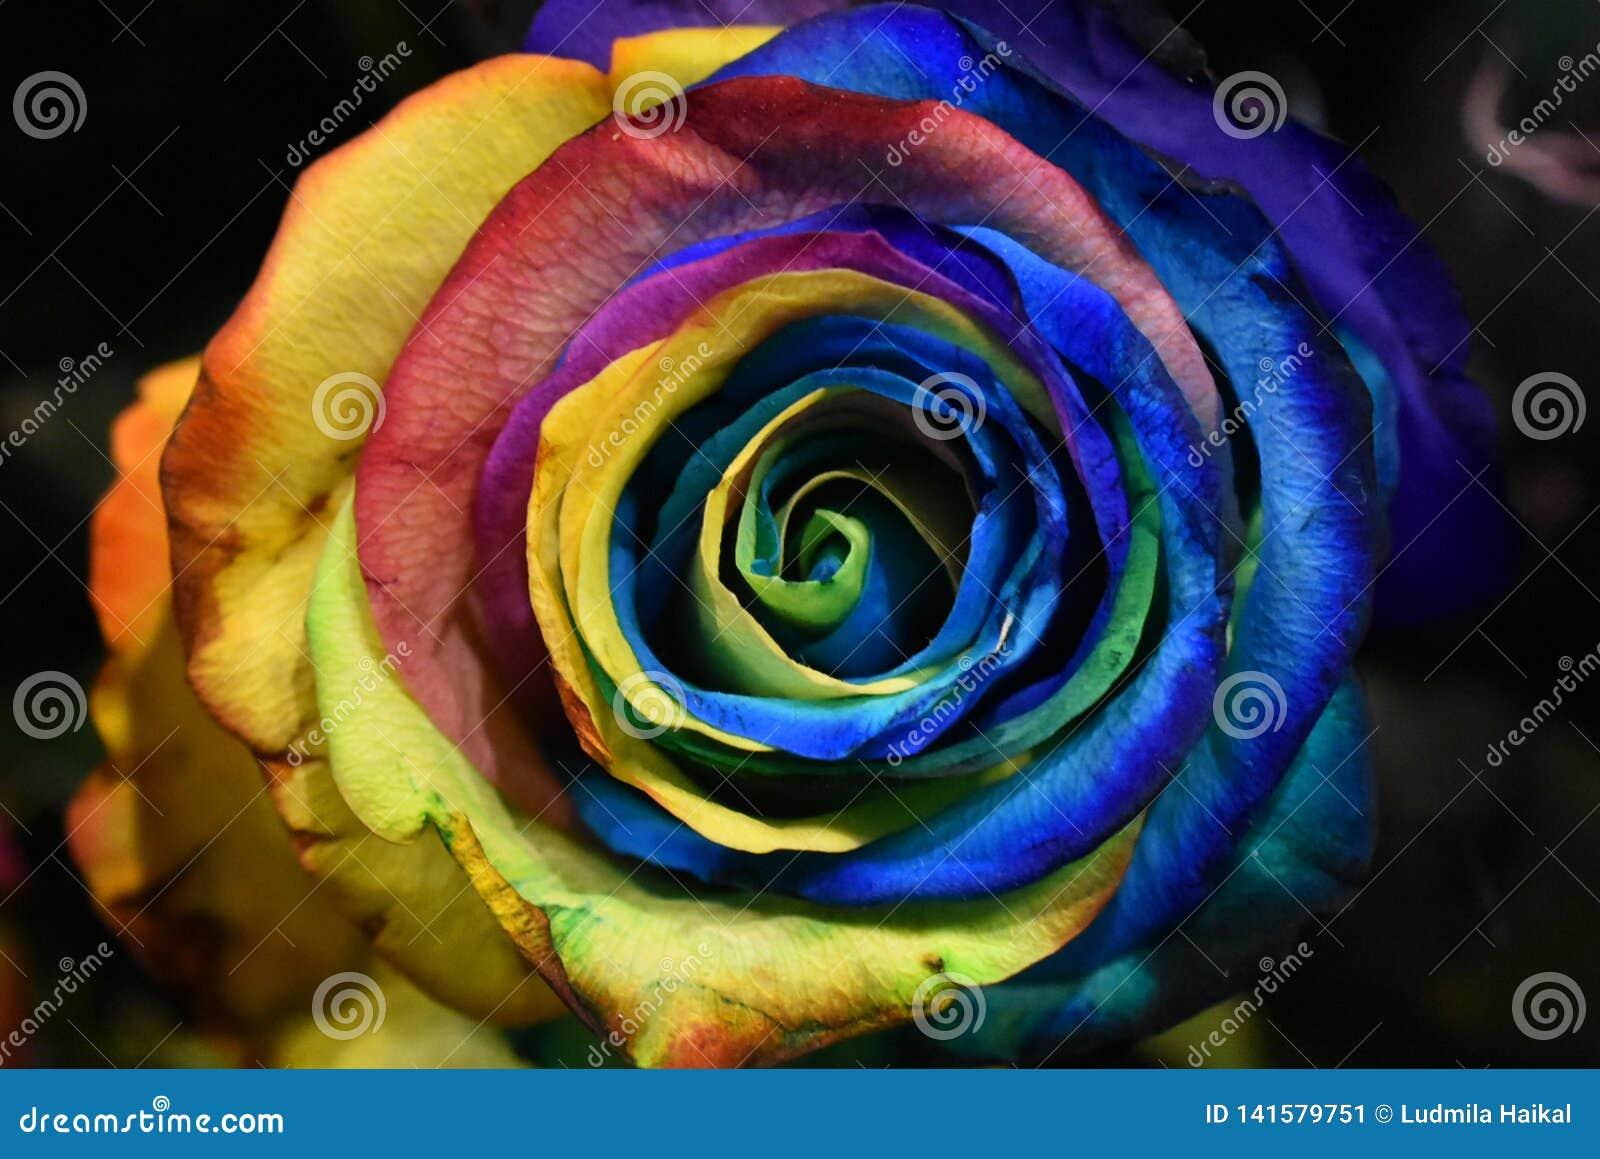 Planta de Rosa, flor colorido de Holambra Brasil